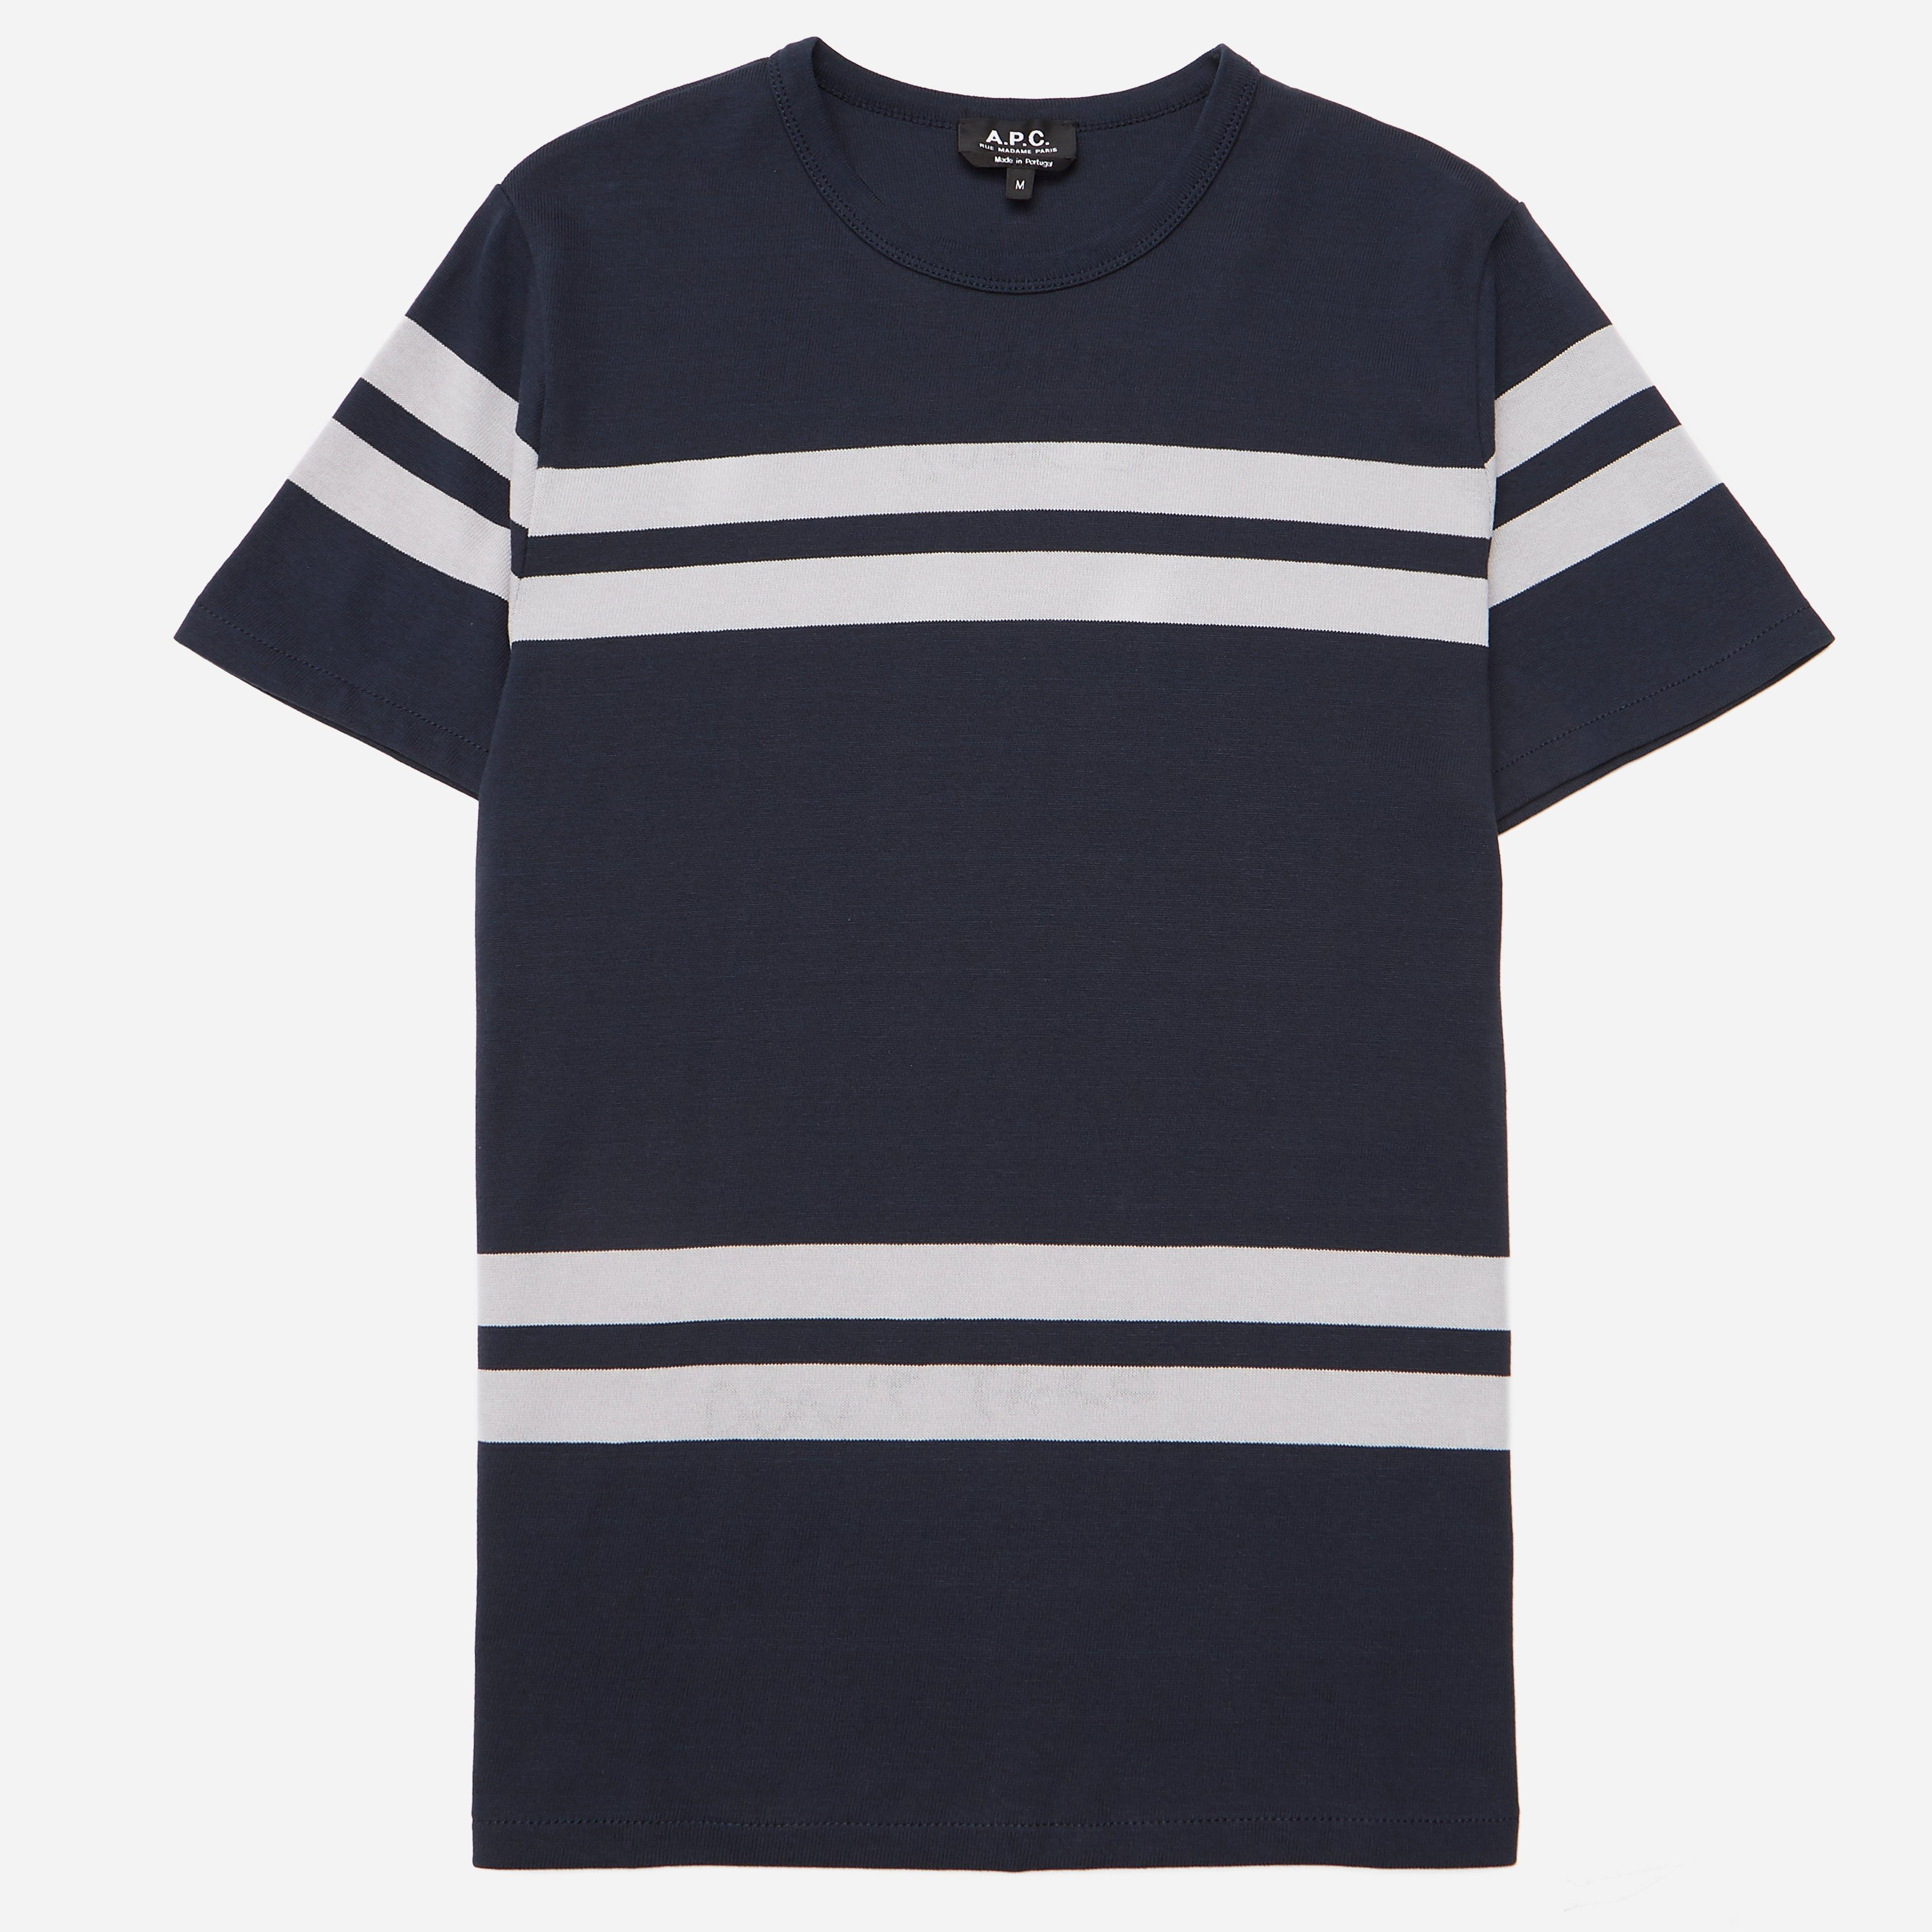 A.P.C. Stitch T-shirt